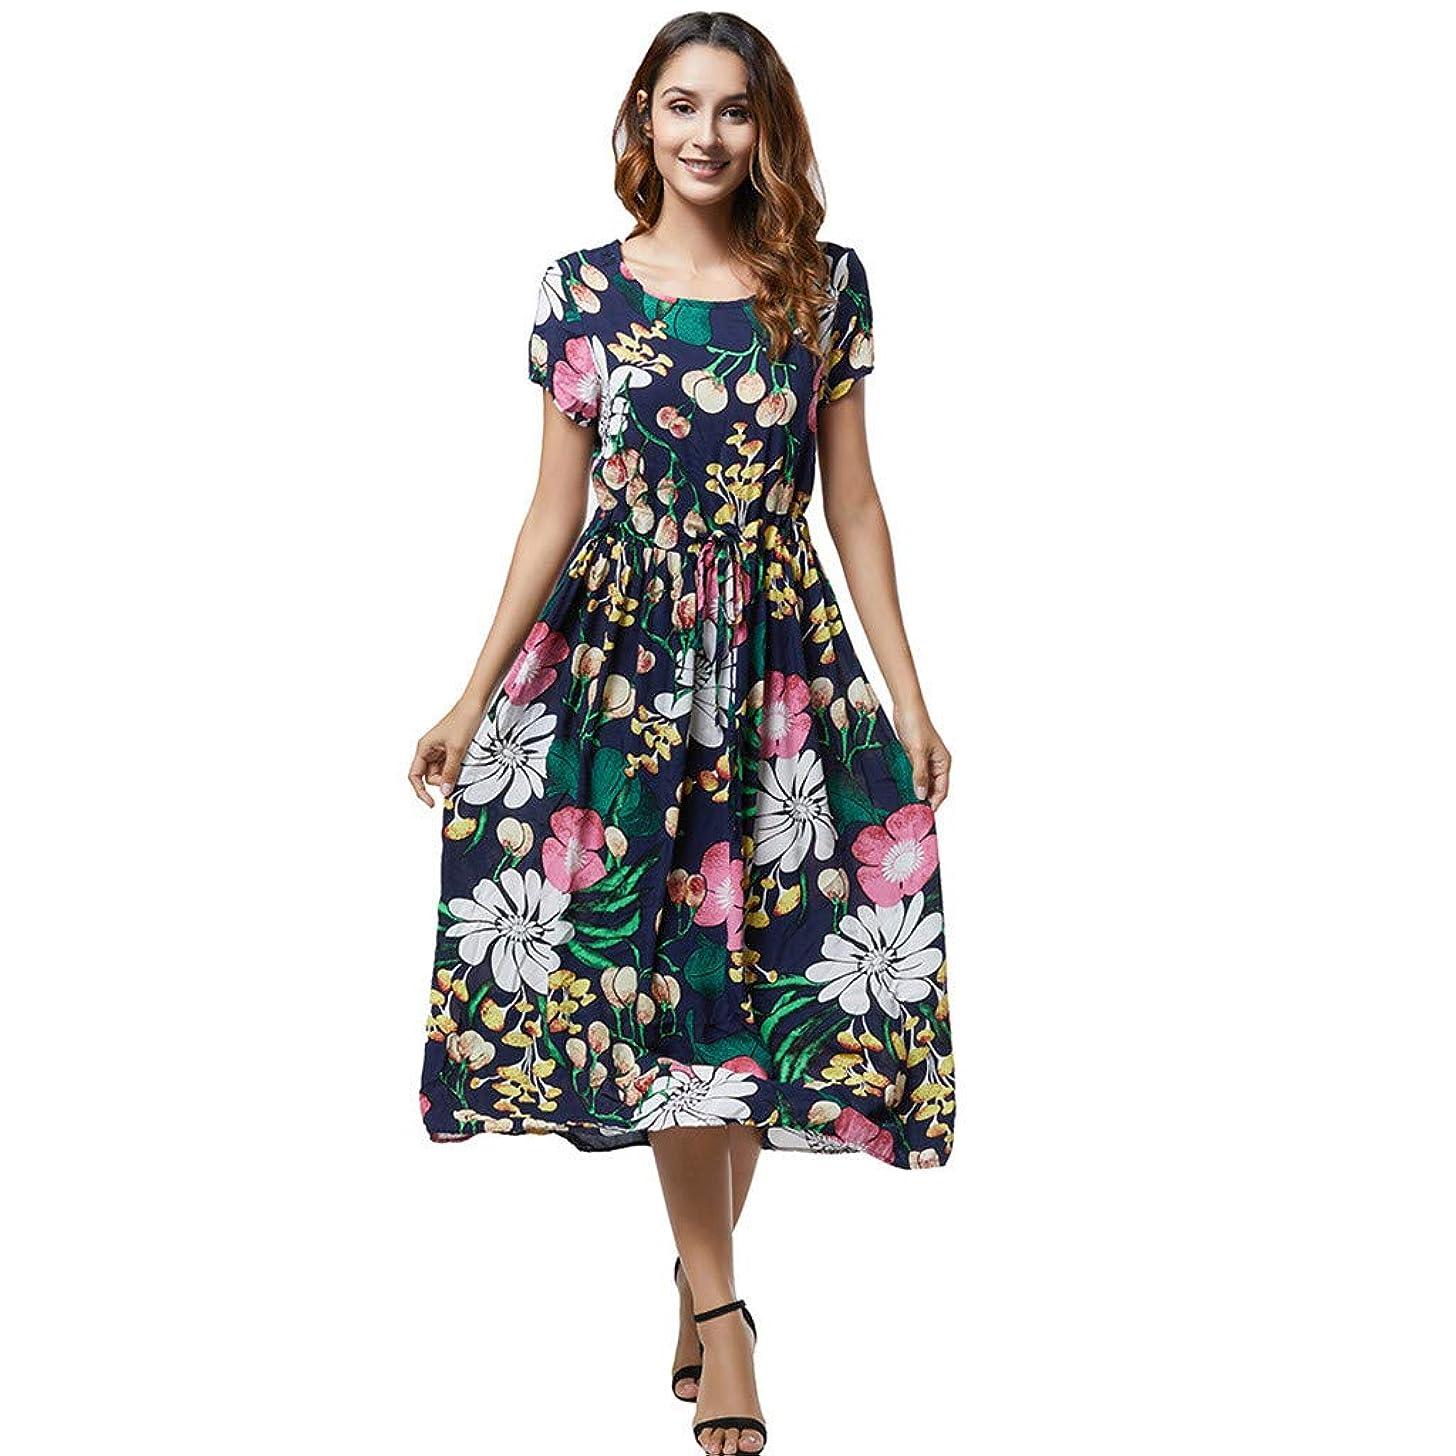 Women Boho Aline Midi Dress Summer Casual Crew Neck Short Sleeve Flowy Pleated Swing Tie Strap Floral Print Beach Dresses